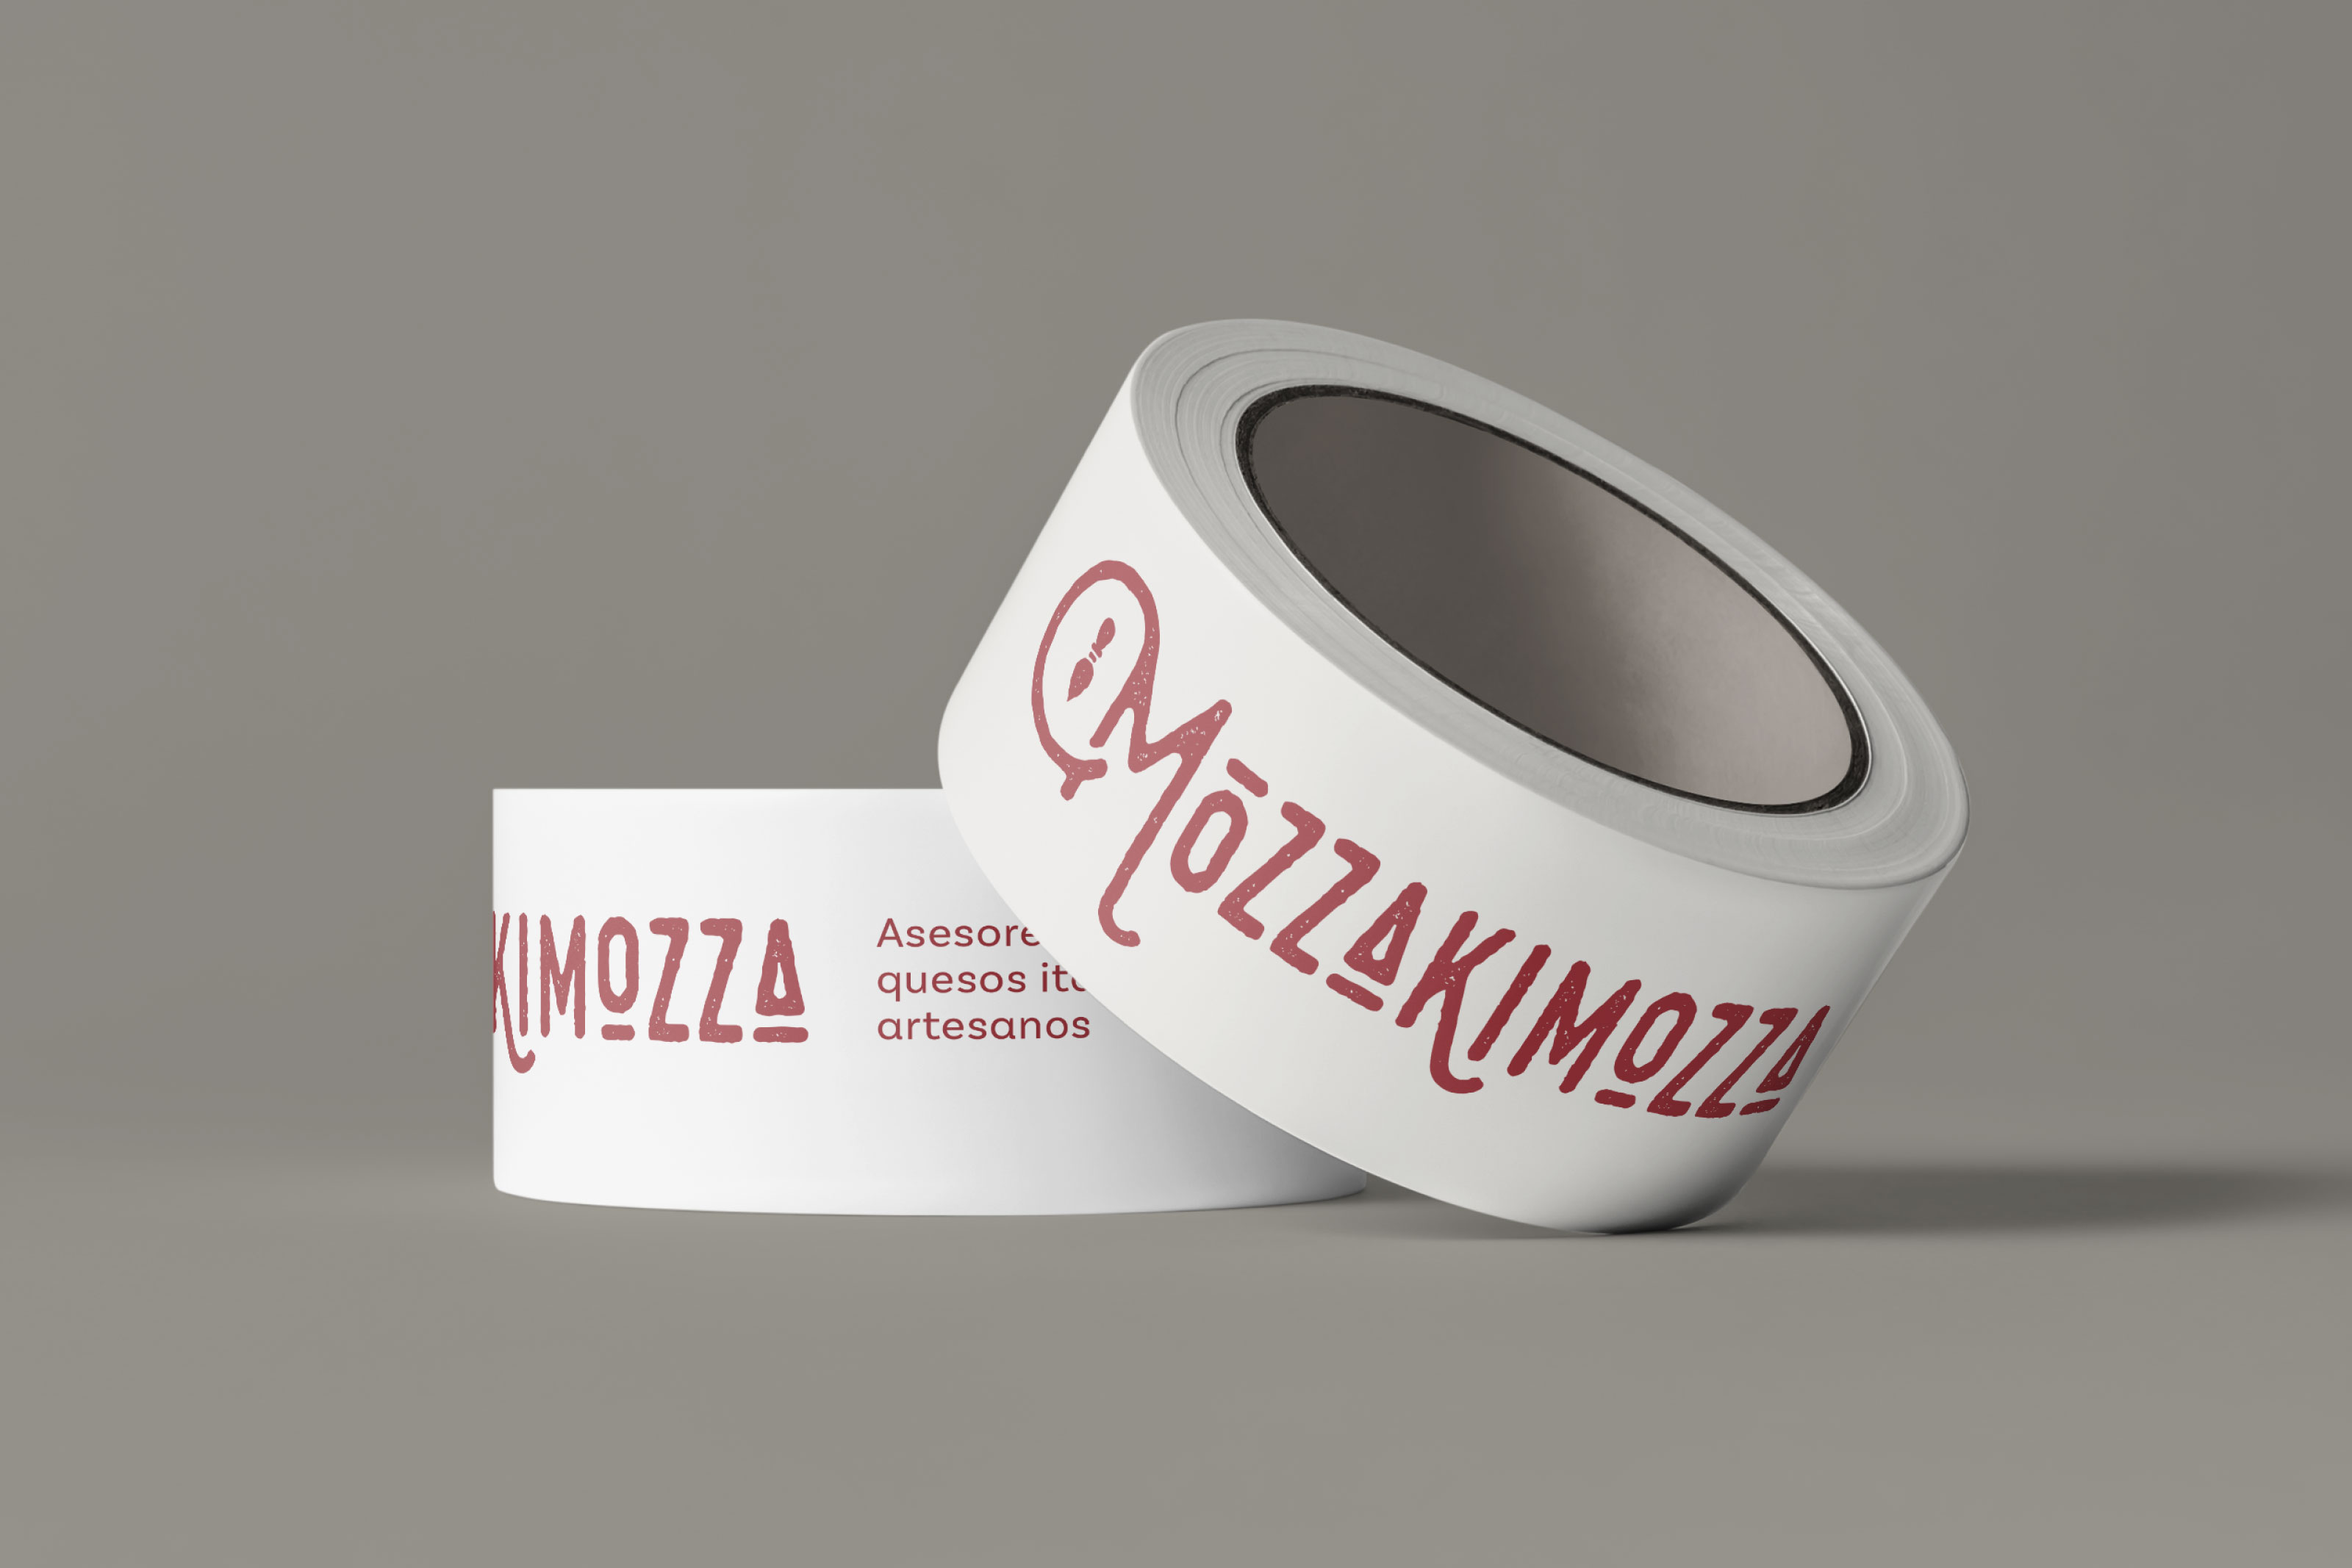 logo-redesign-mozzakimozza